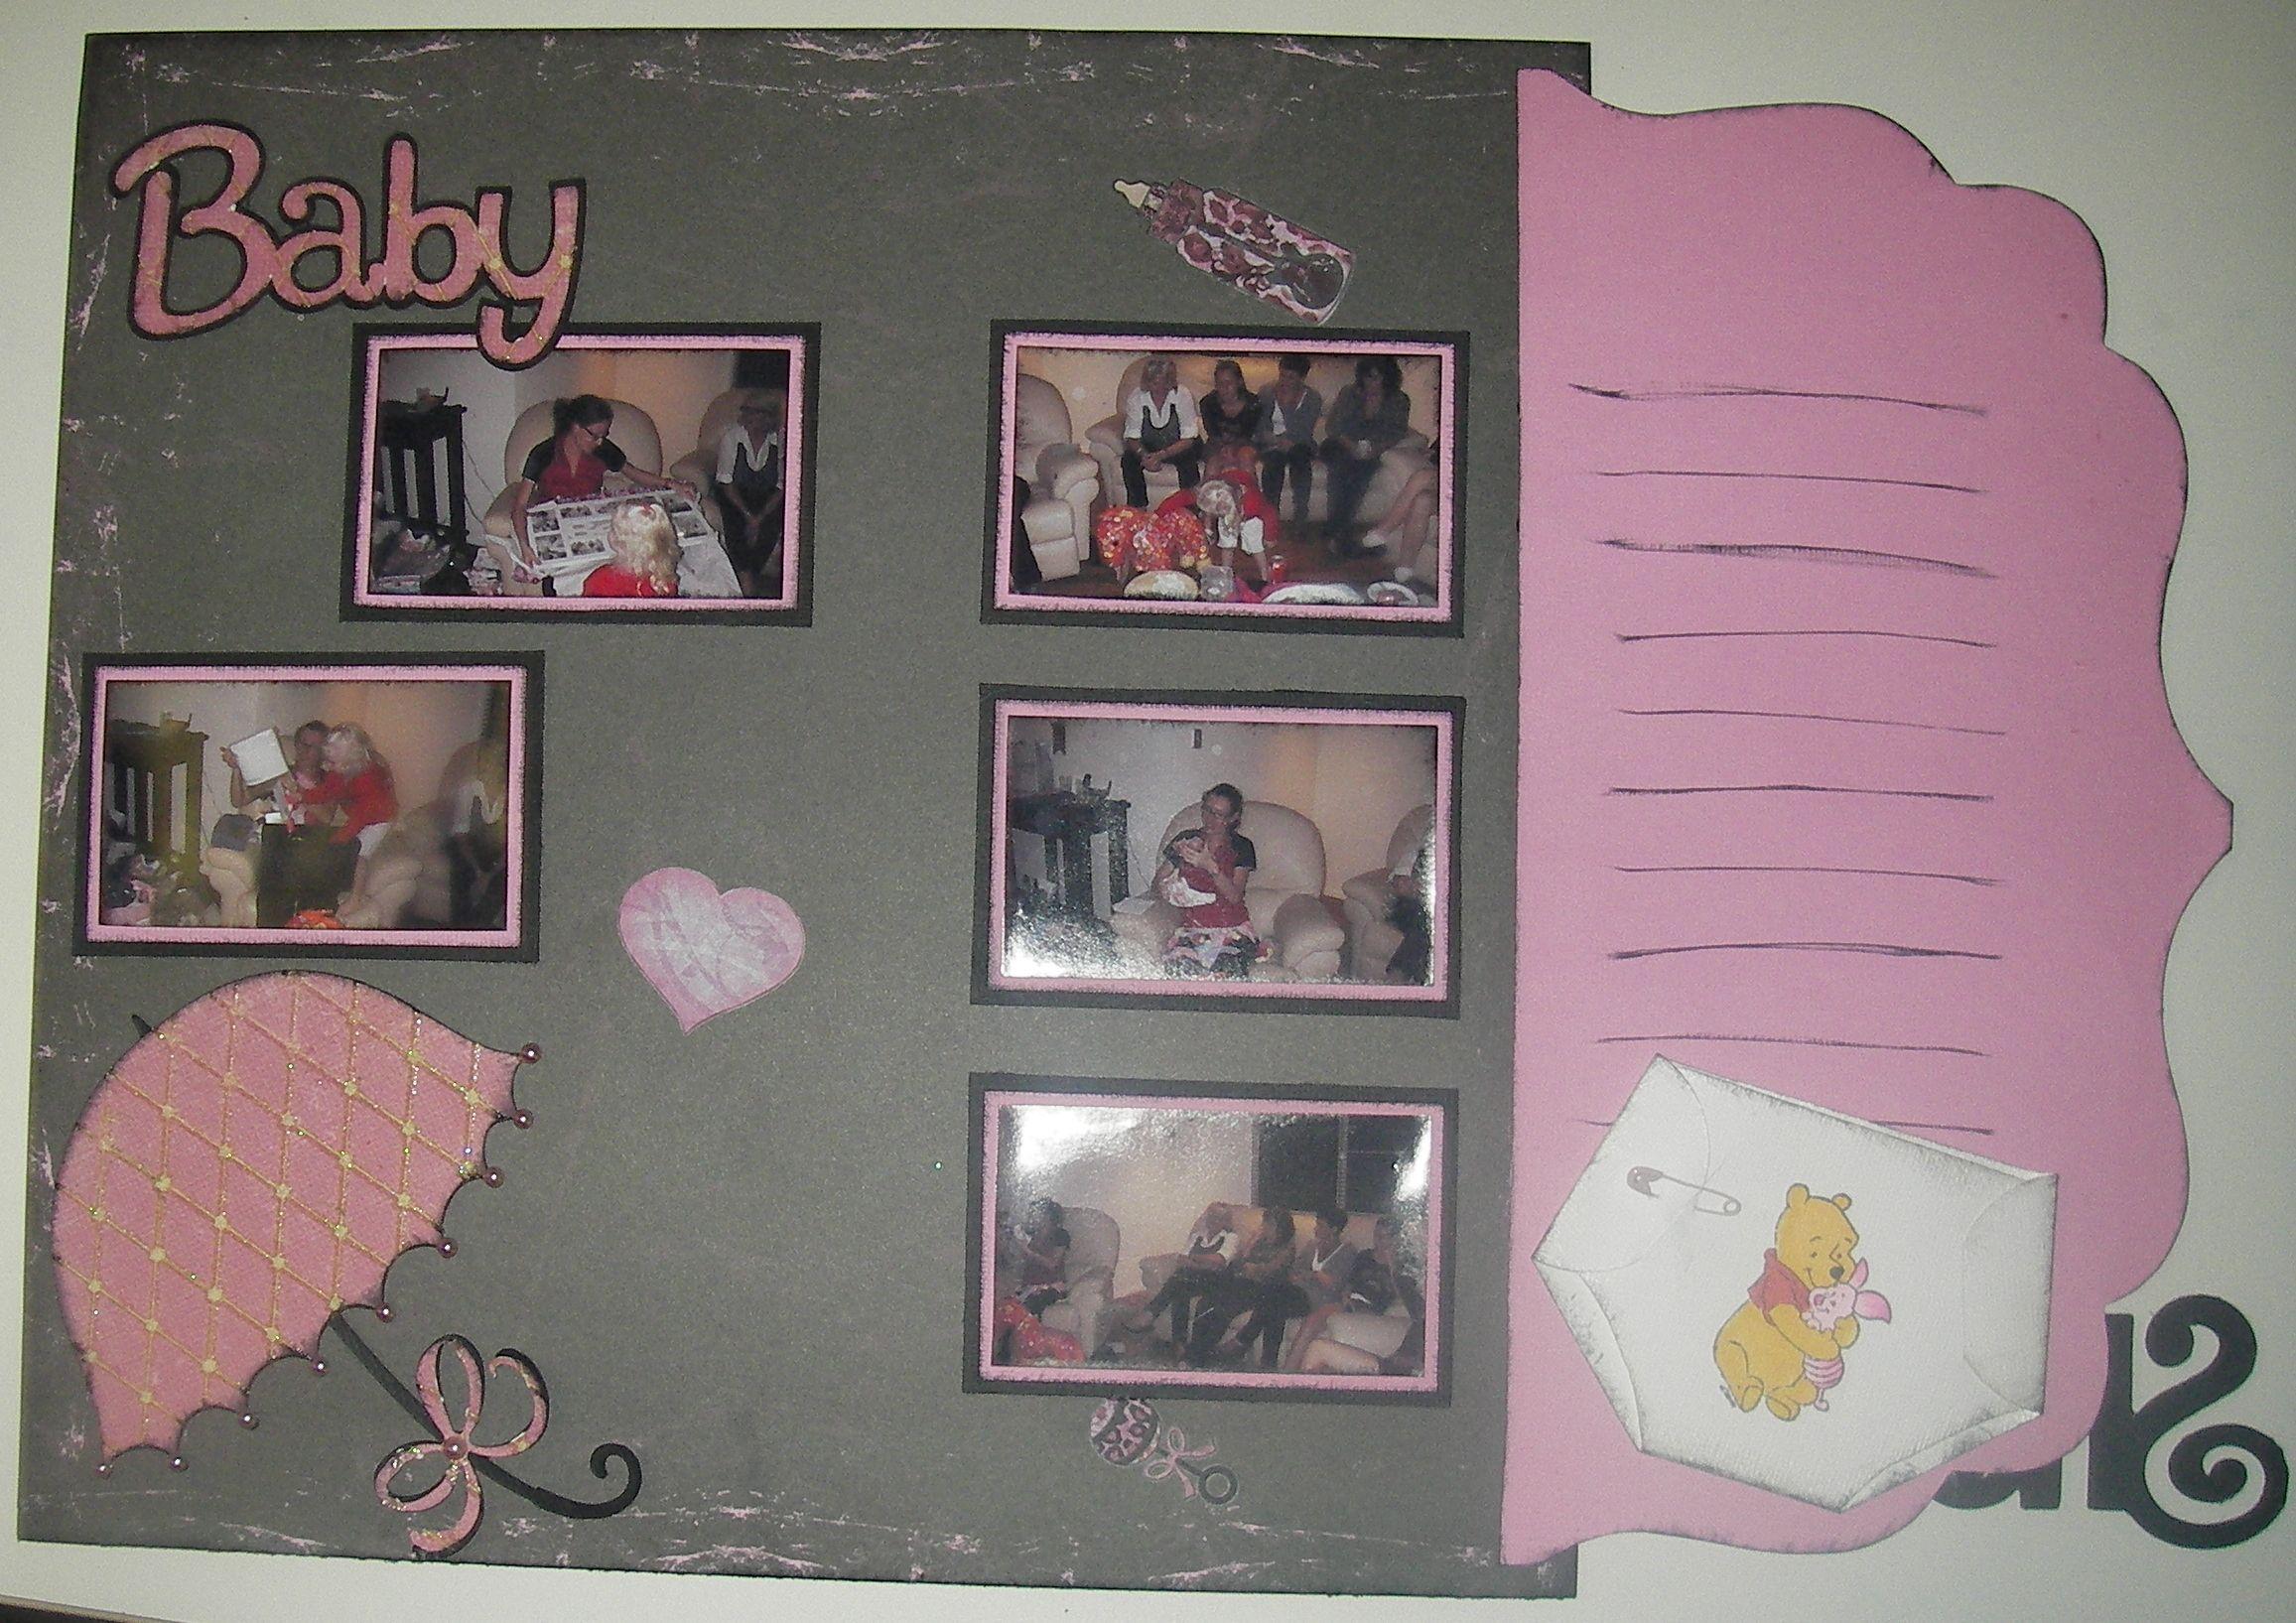 Baby Shower Scrapbook Scrapbooking Ideas Pinterest Baby